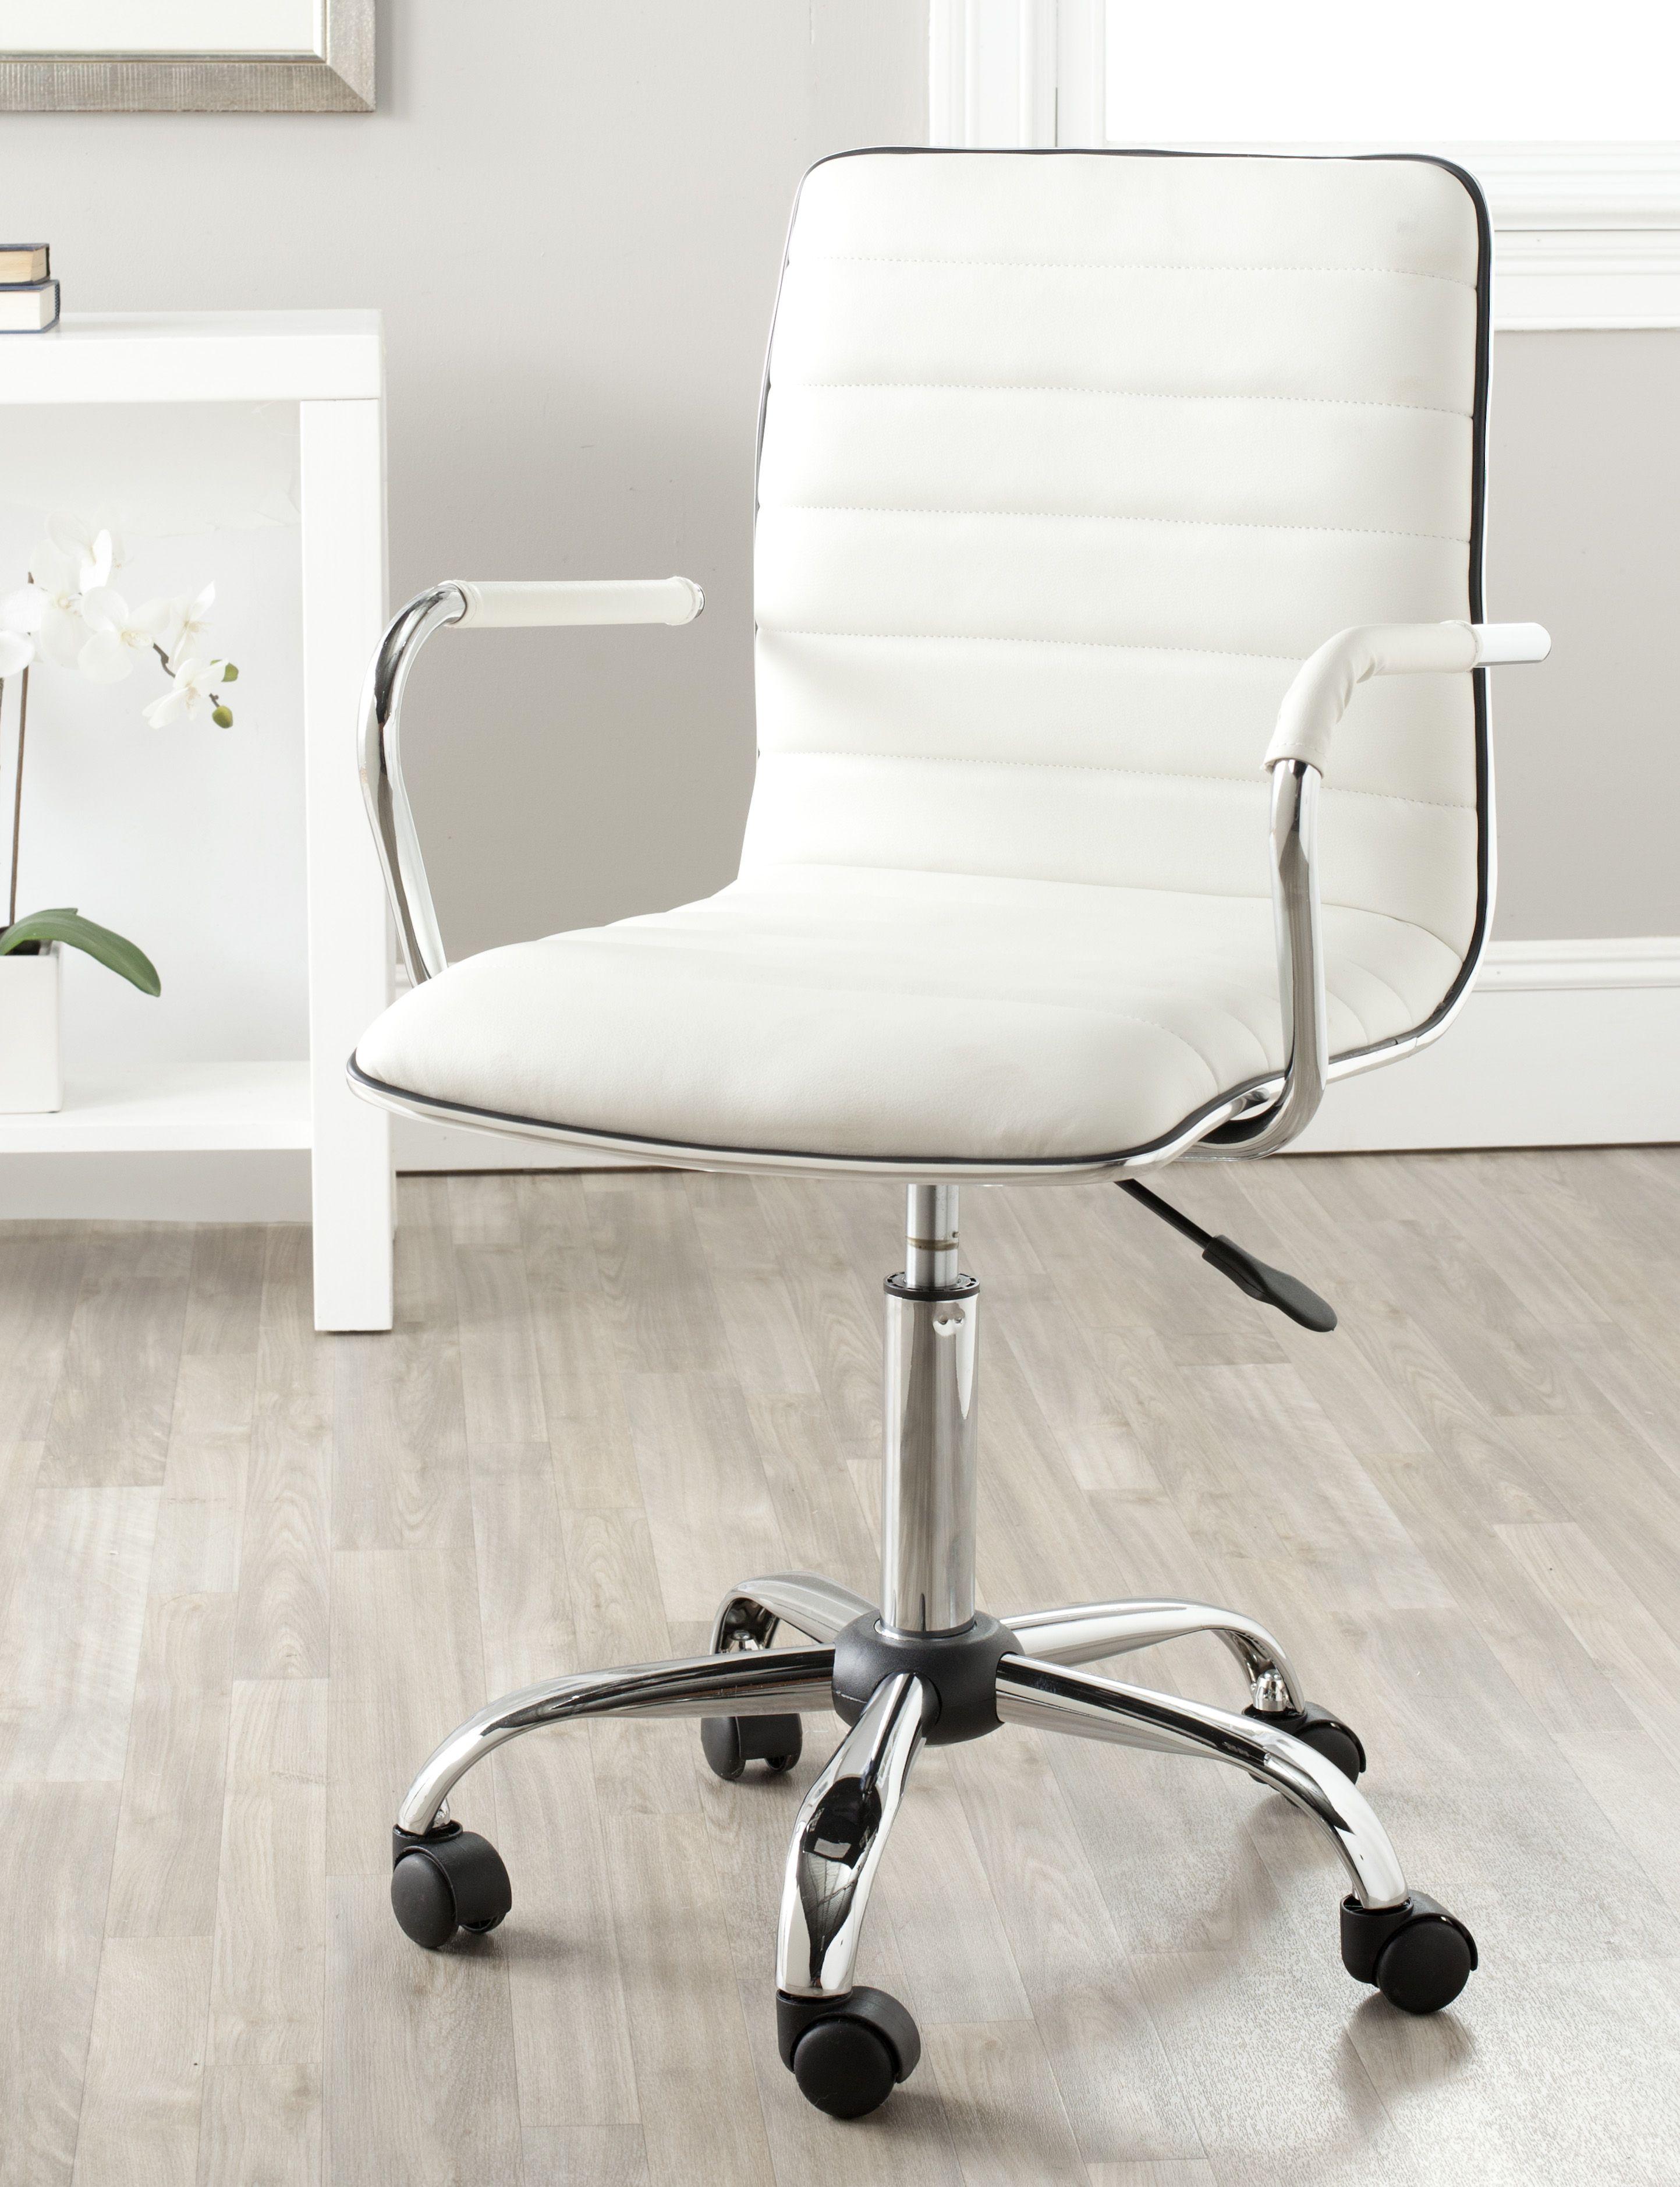 Safavieh Jonika Modern Glam Solid Swivel Desk Chair Walmart Com In 2020 White Desk Chair Adjustable Height Desk Chair Swivel Chair Desk